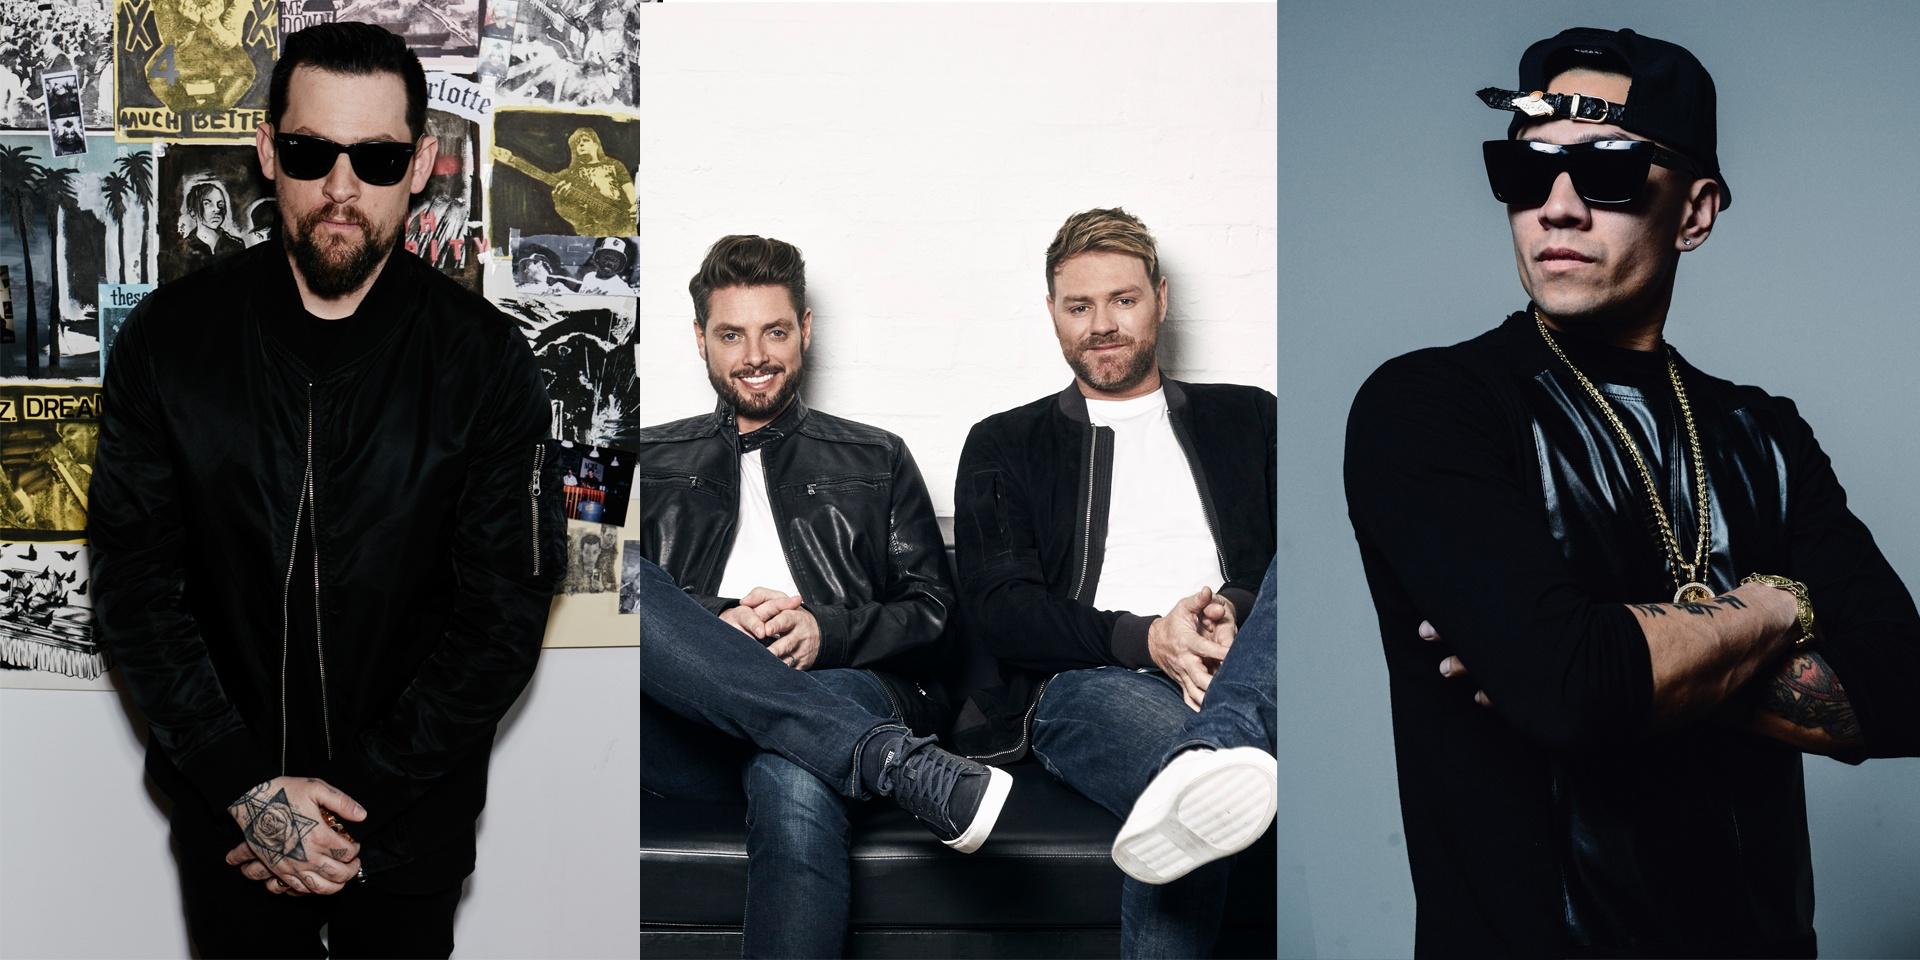 Boyzlife, Joel Madden (Good Charlotte) and Taboo (The Black Eyed Peas) to headline The Podium Lounge